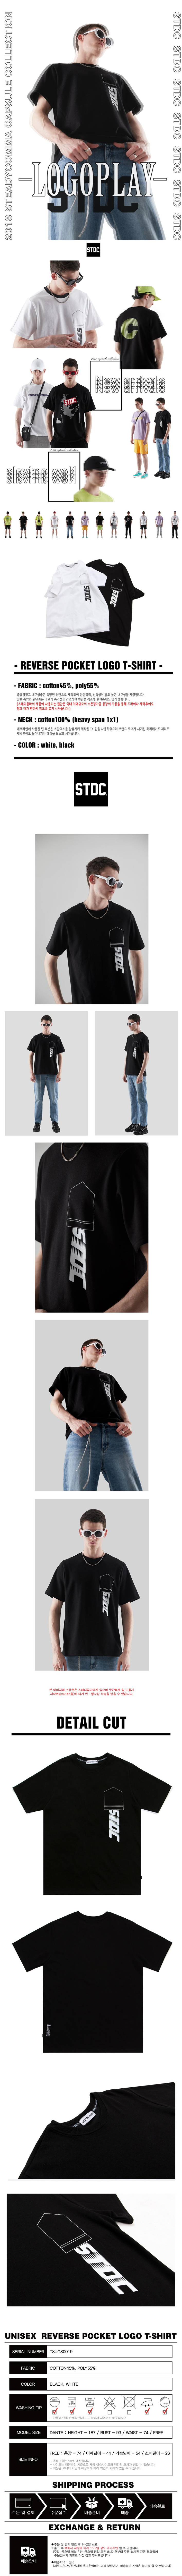 REVERSE POCKET LOGO T-SHIRTS BLACK.jpg